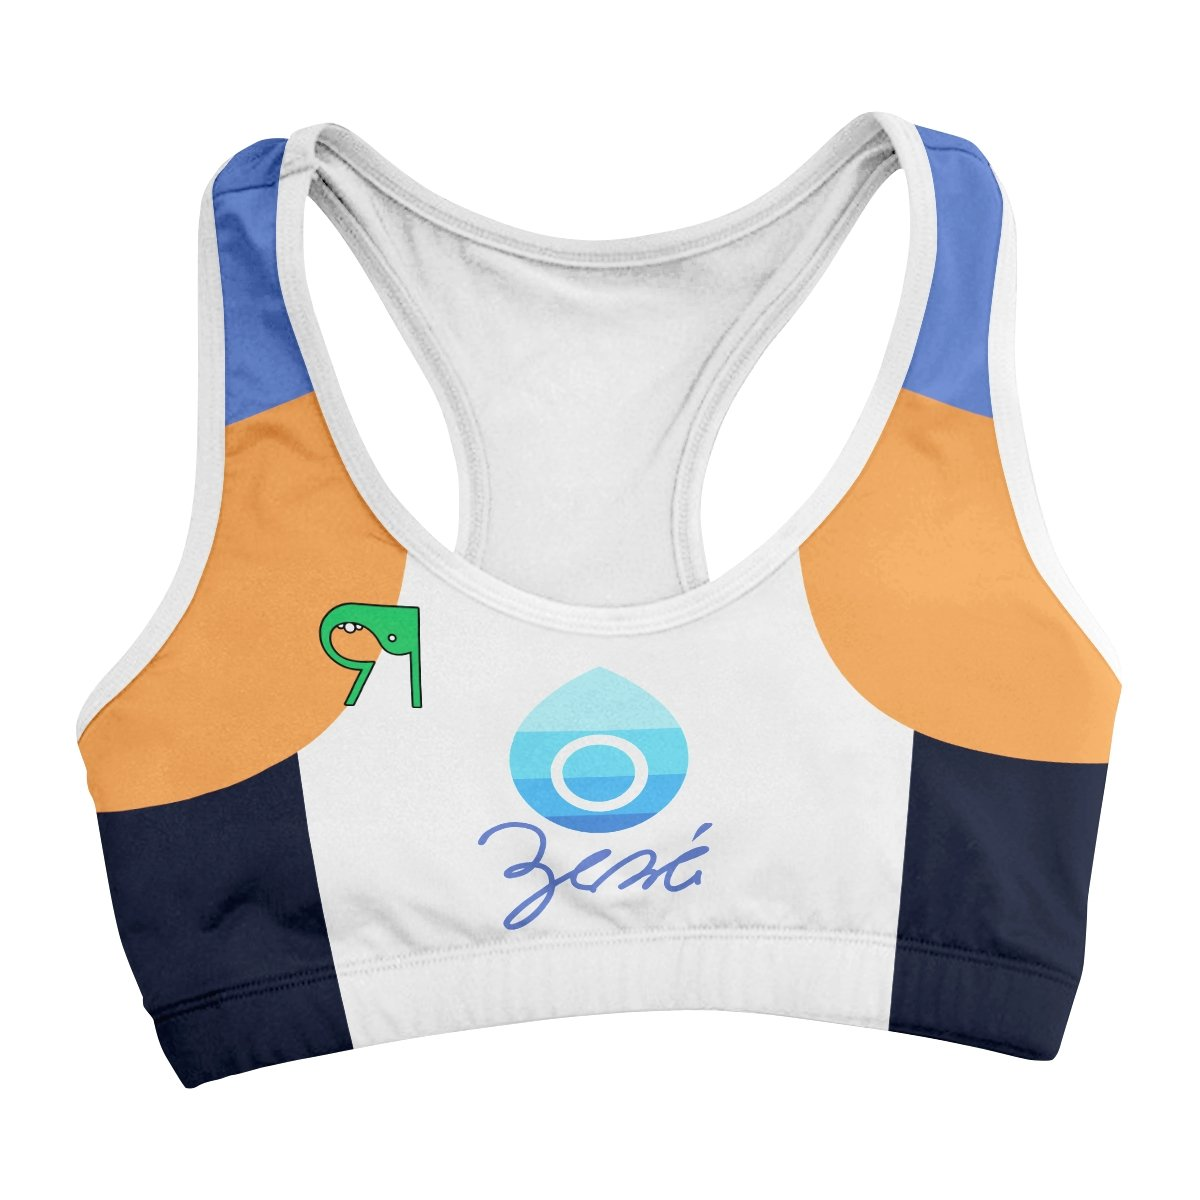 pokemon water uniform active wear set 157774 - Anime Swimsuits